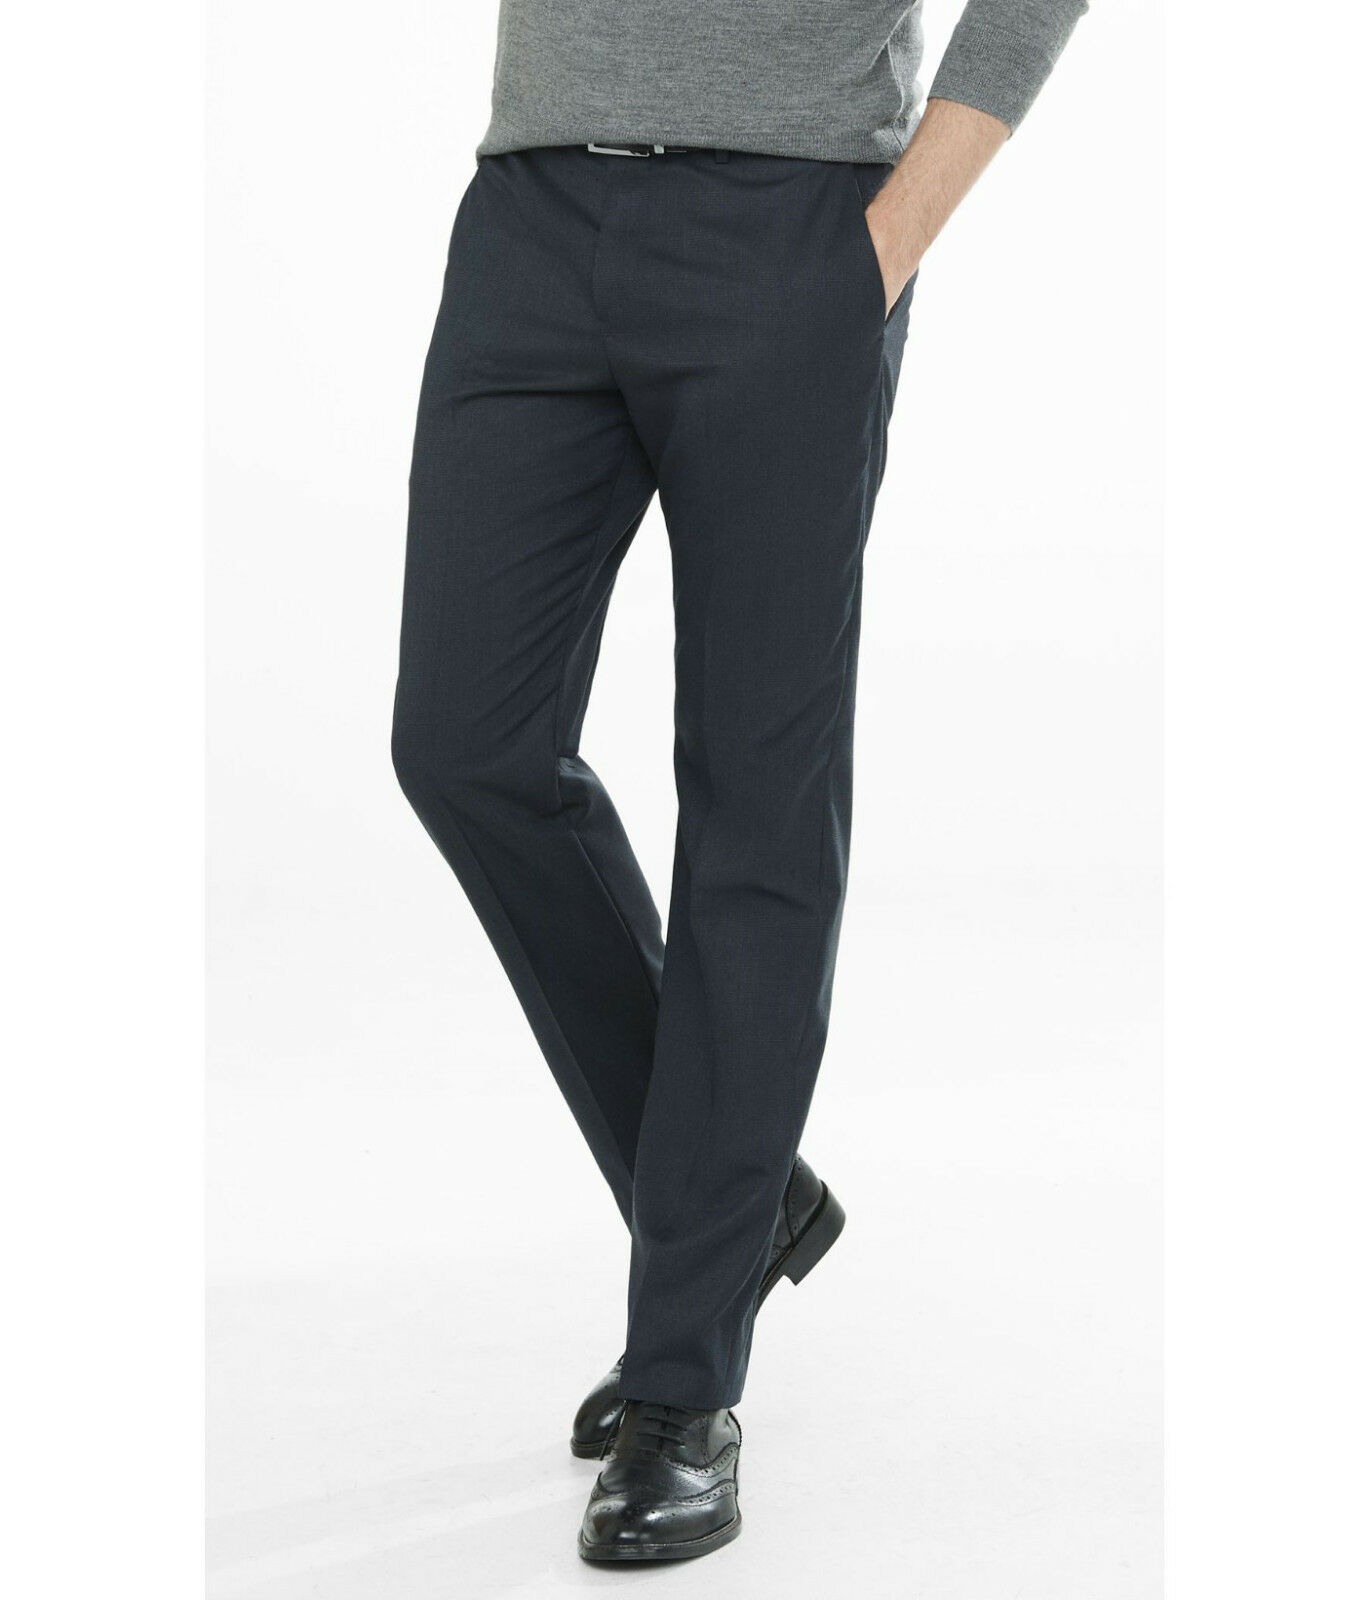 NEW EXPRESS  NAVY PRODUCER MICRO PRINT WOOL BLEND DRESS PANT SZ 31 32